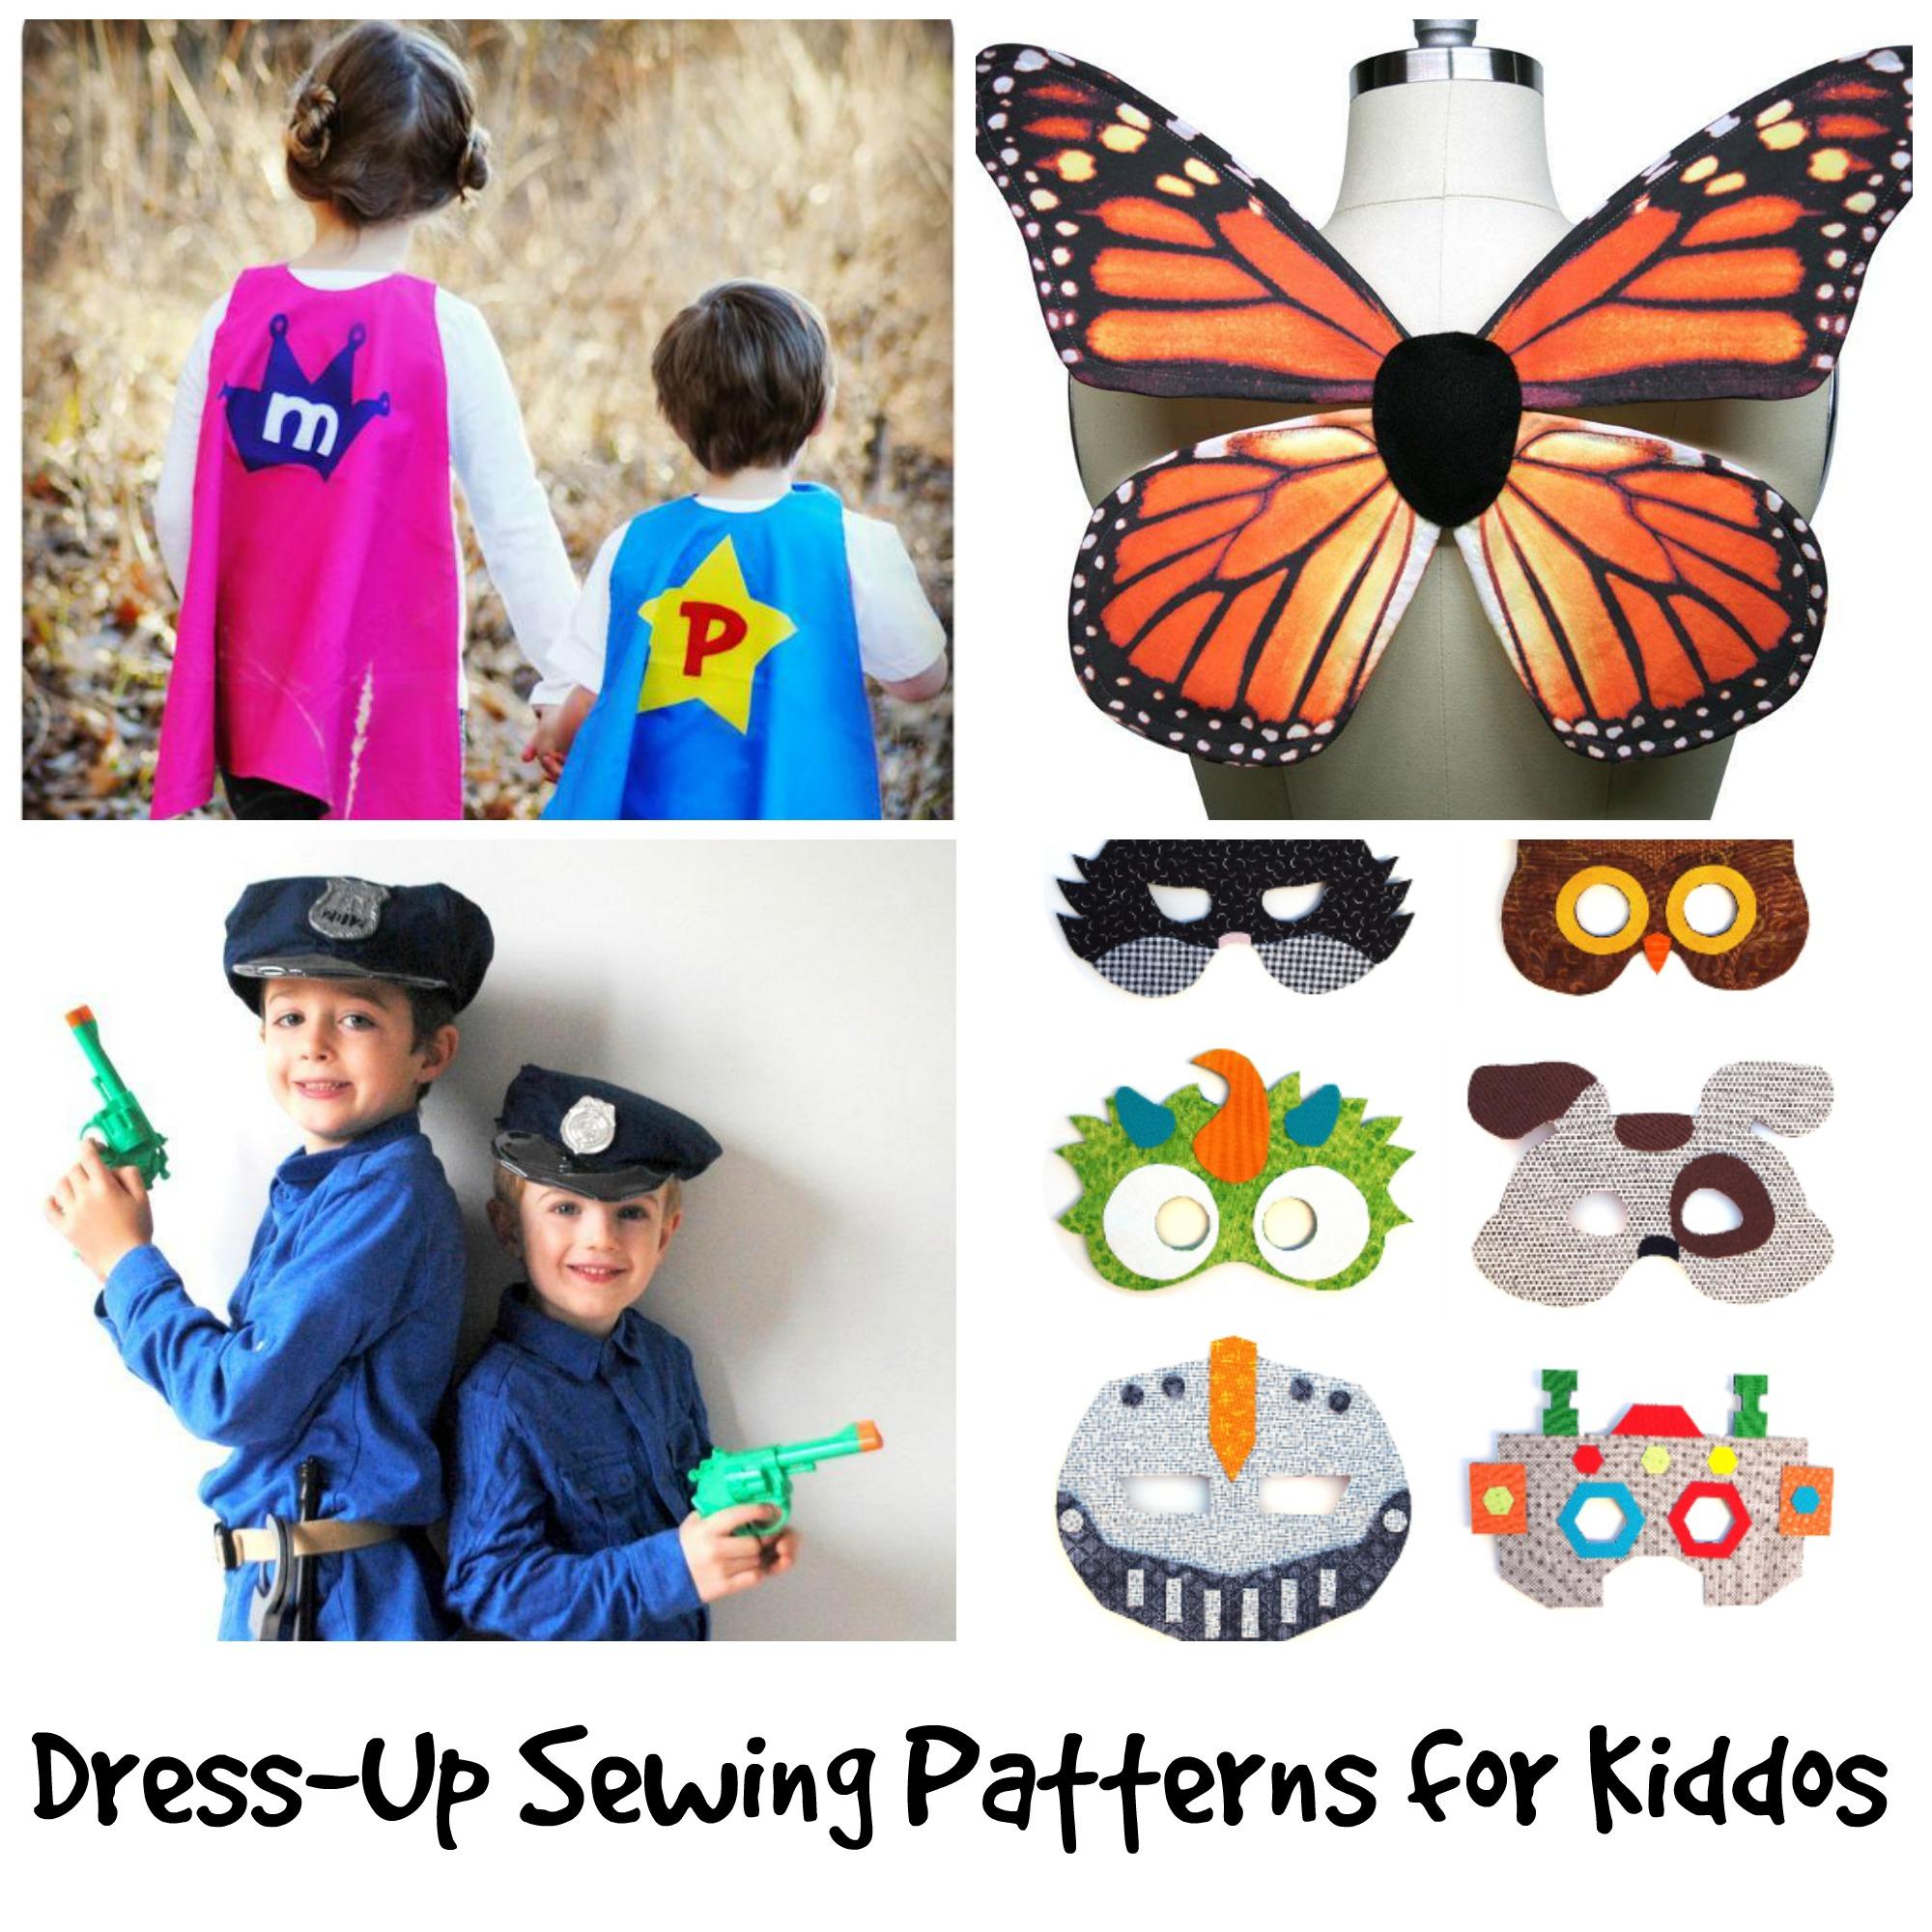 DIY Dress Up Sewing Patterns for Kids